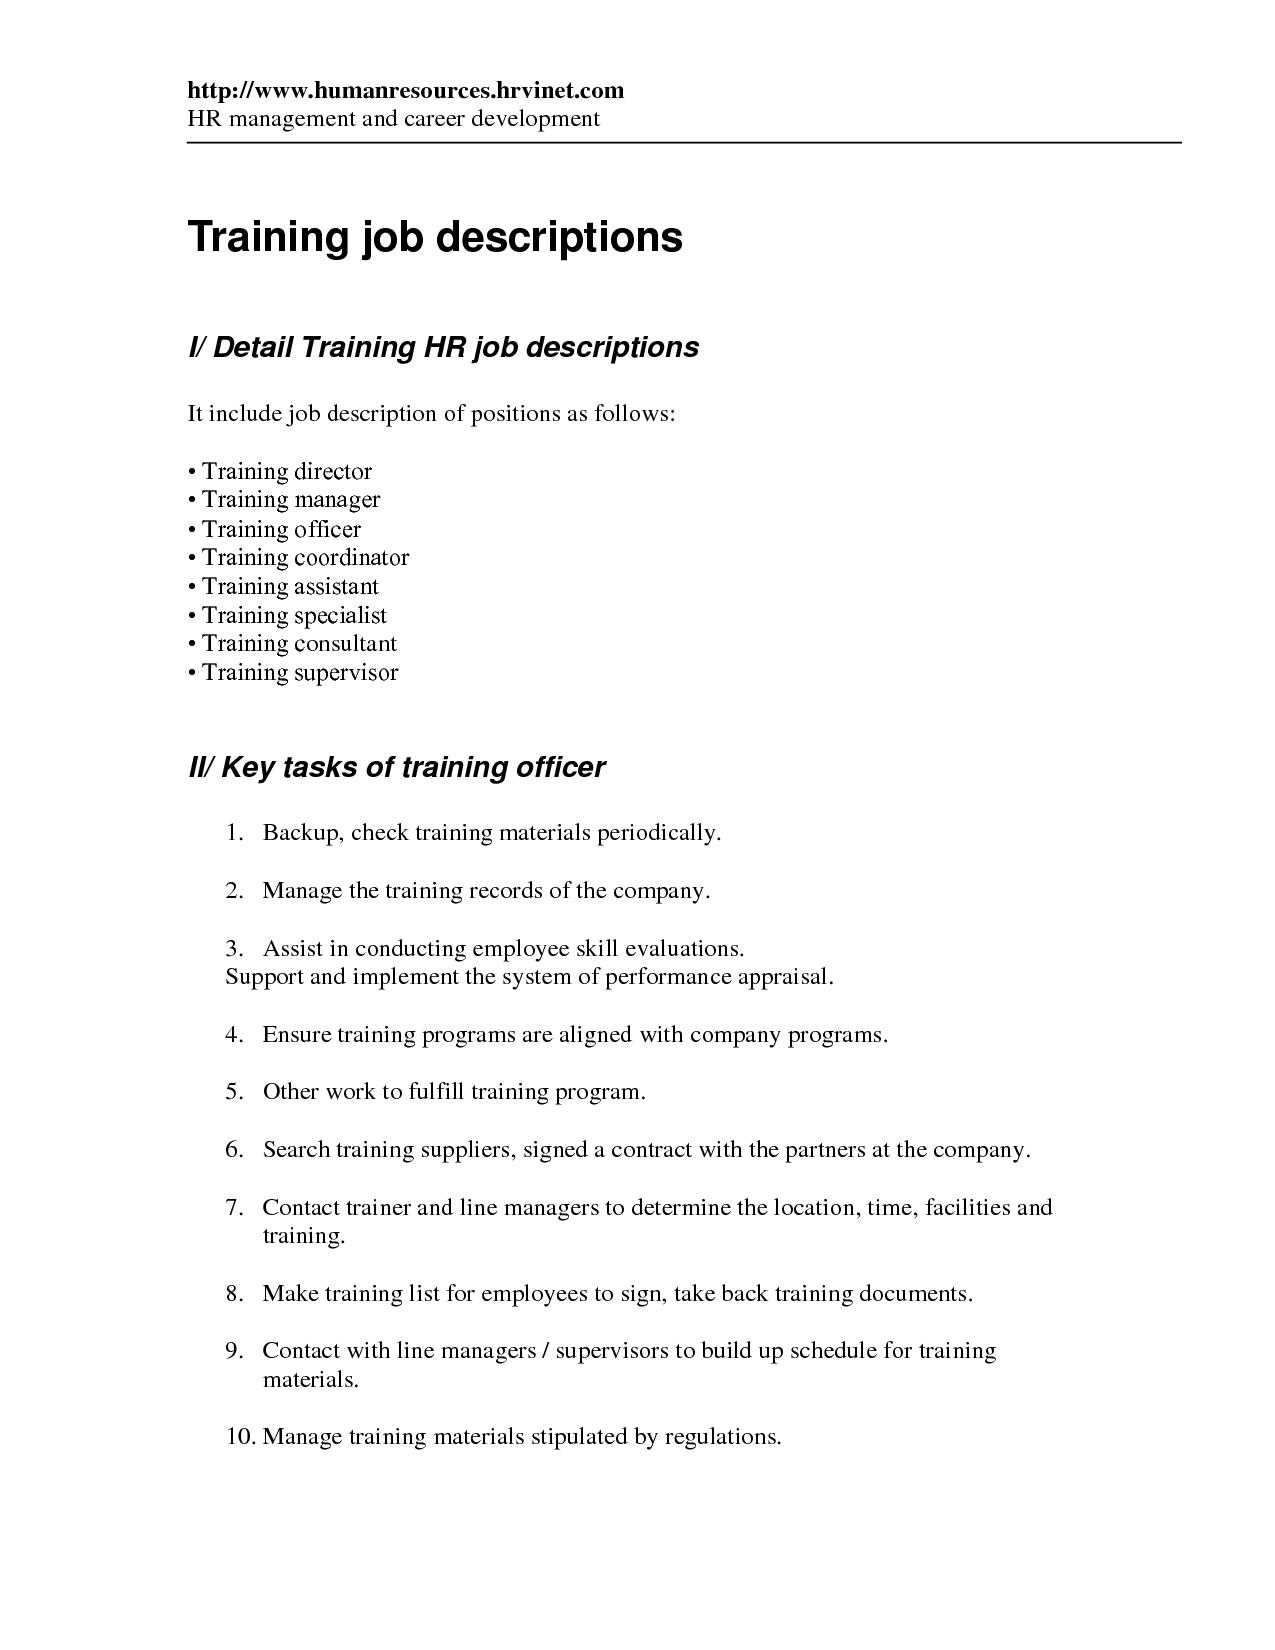 Training Job Description